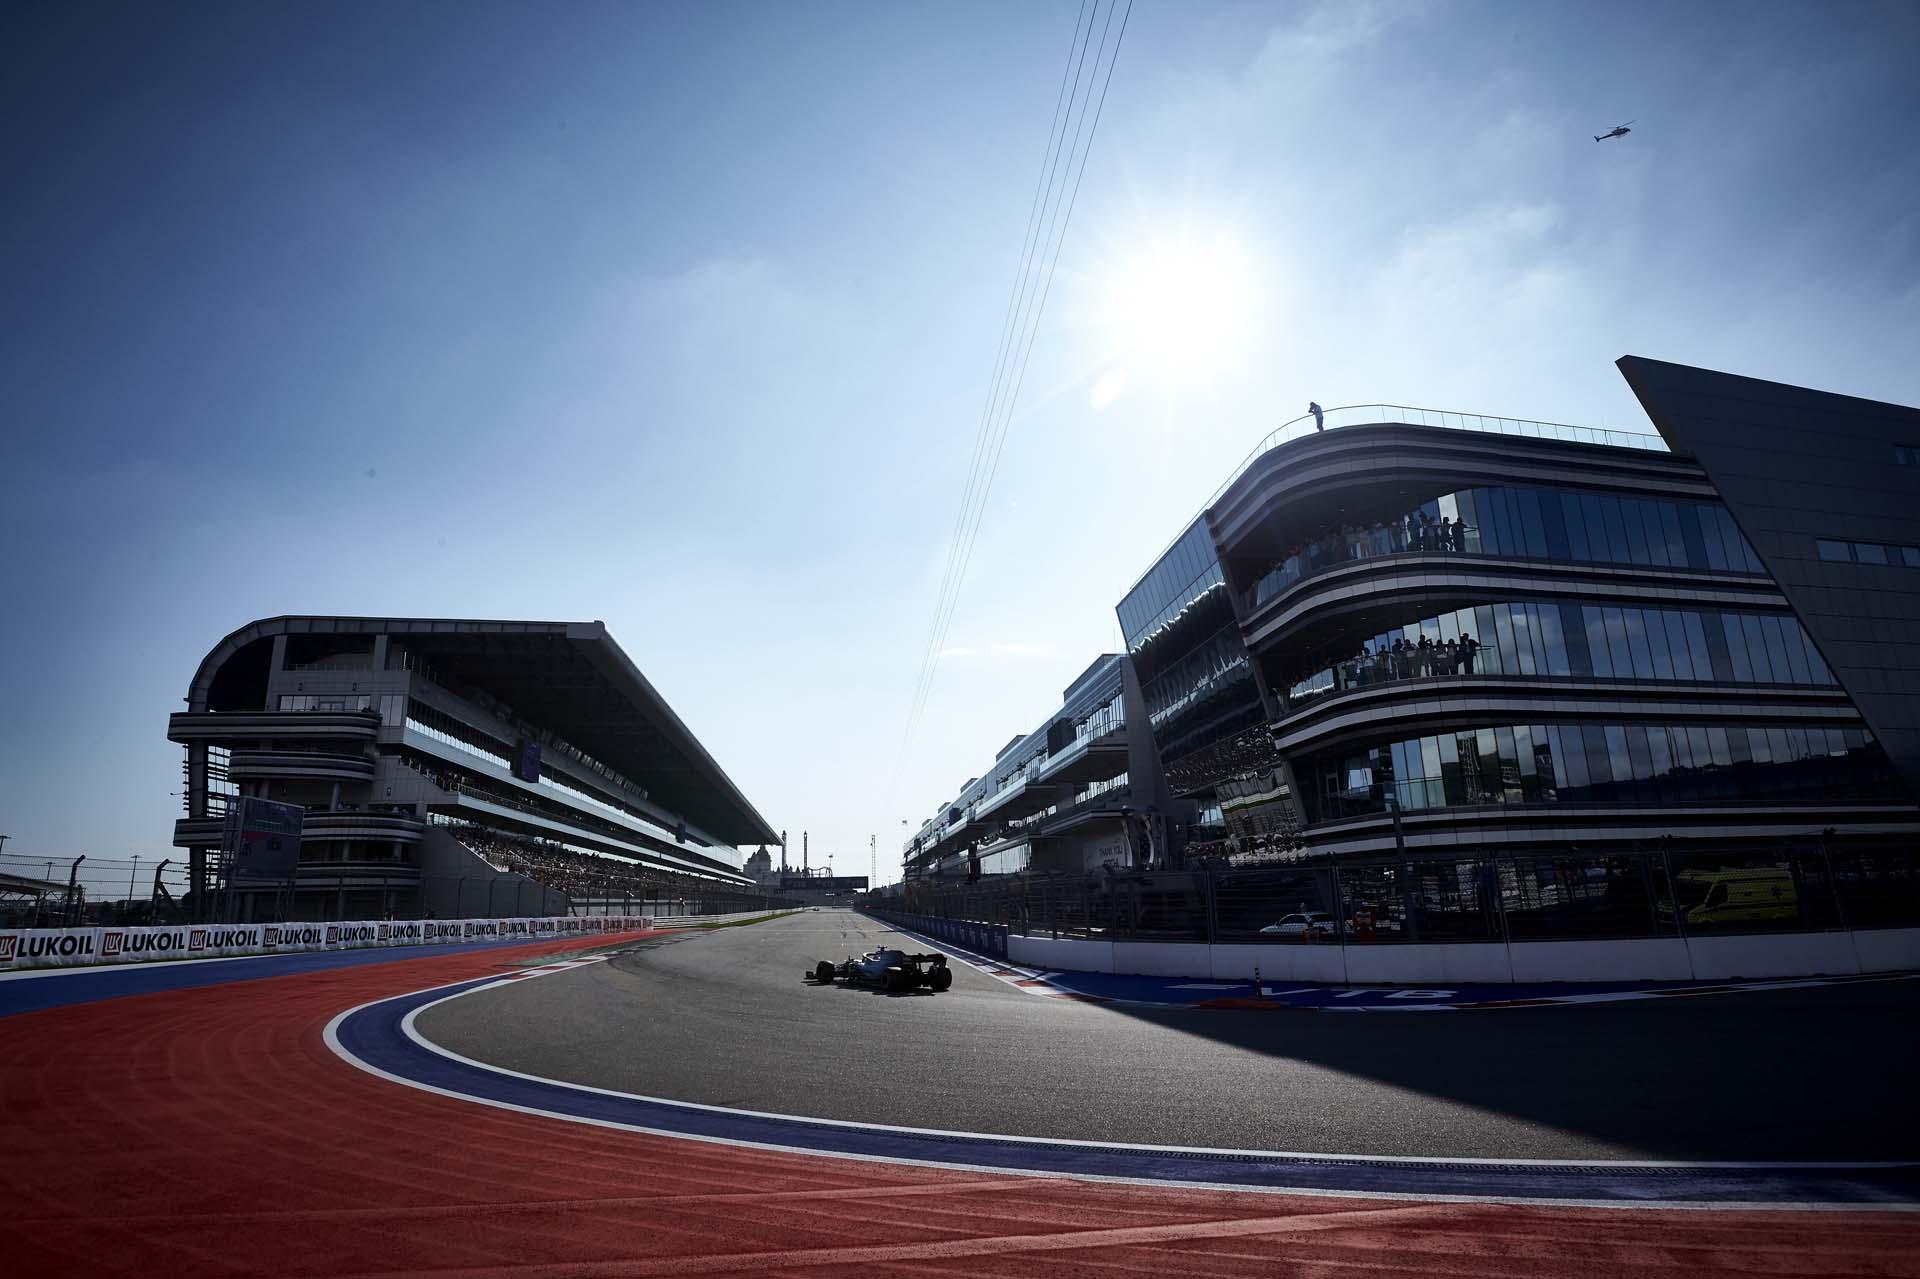 2019 Russian Grand Prix, Saturday - Steve Etherington